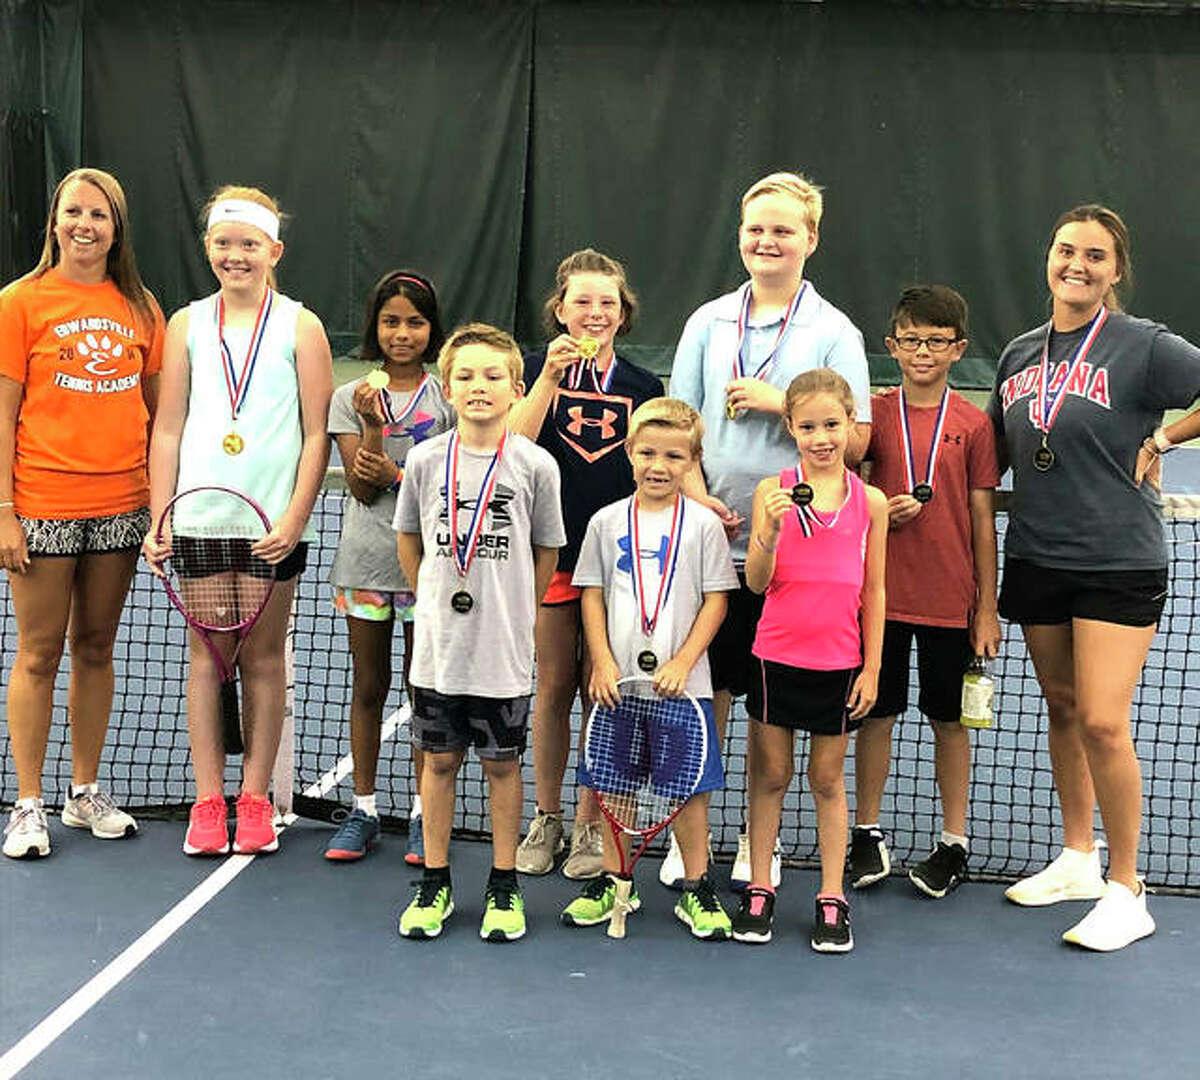 The 10 and under team from Edwardsville Tennis Academy won the St. Louis District in Junior Team Tennis.